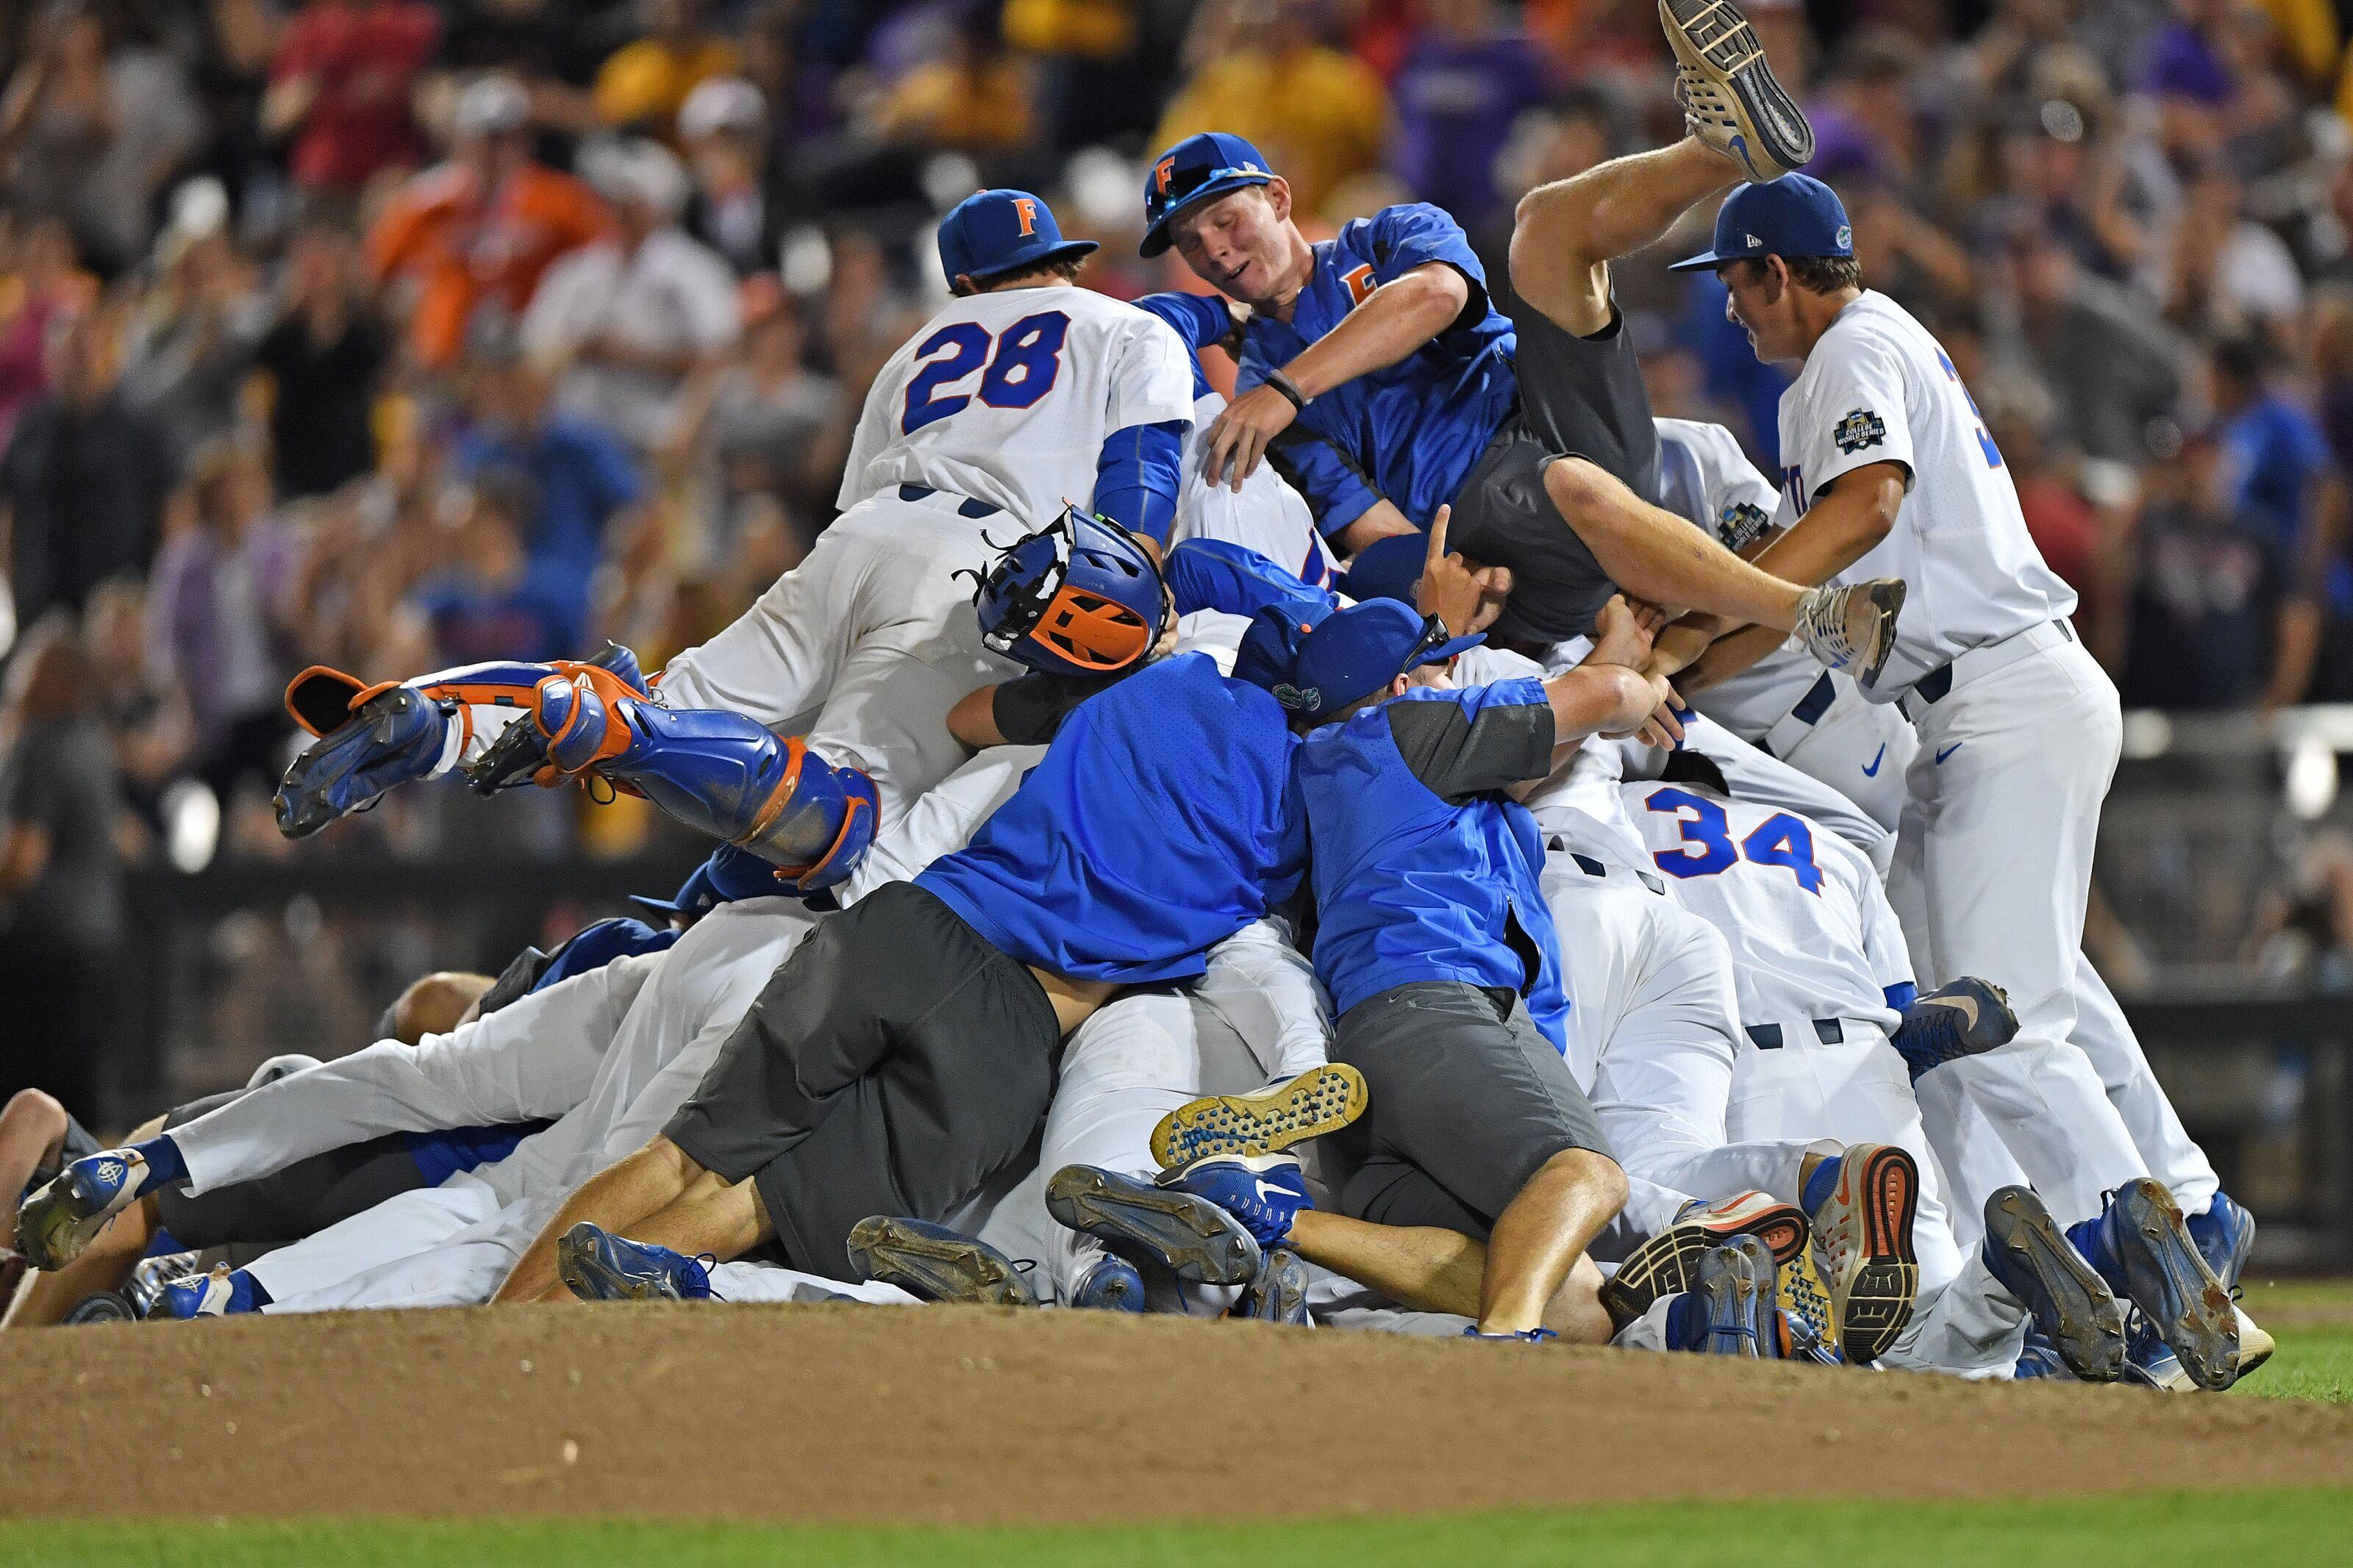 Florida Gator baseball heads to Lubbock for NCAA regionals